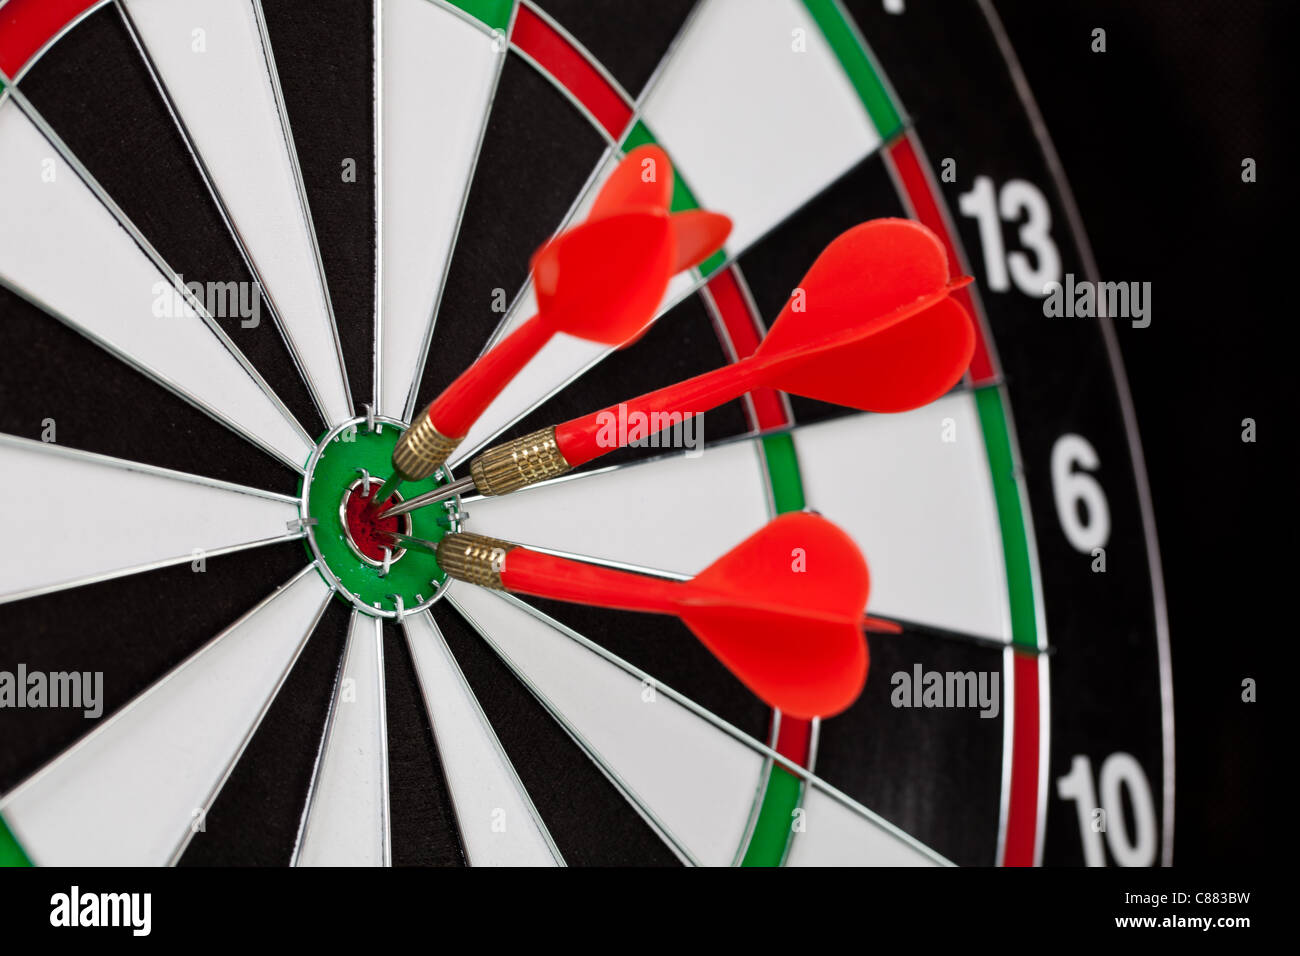 three darts hitting the bullseye on a dartboard stock photo